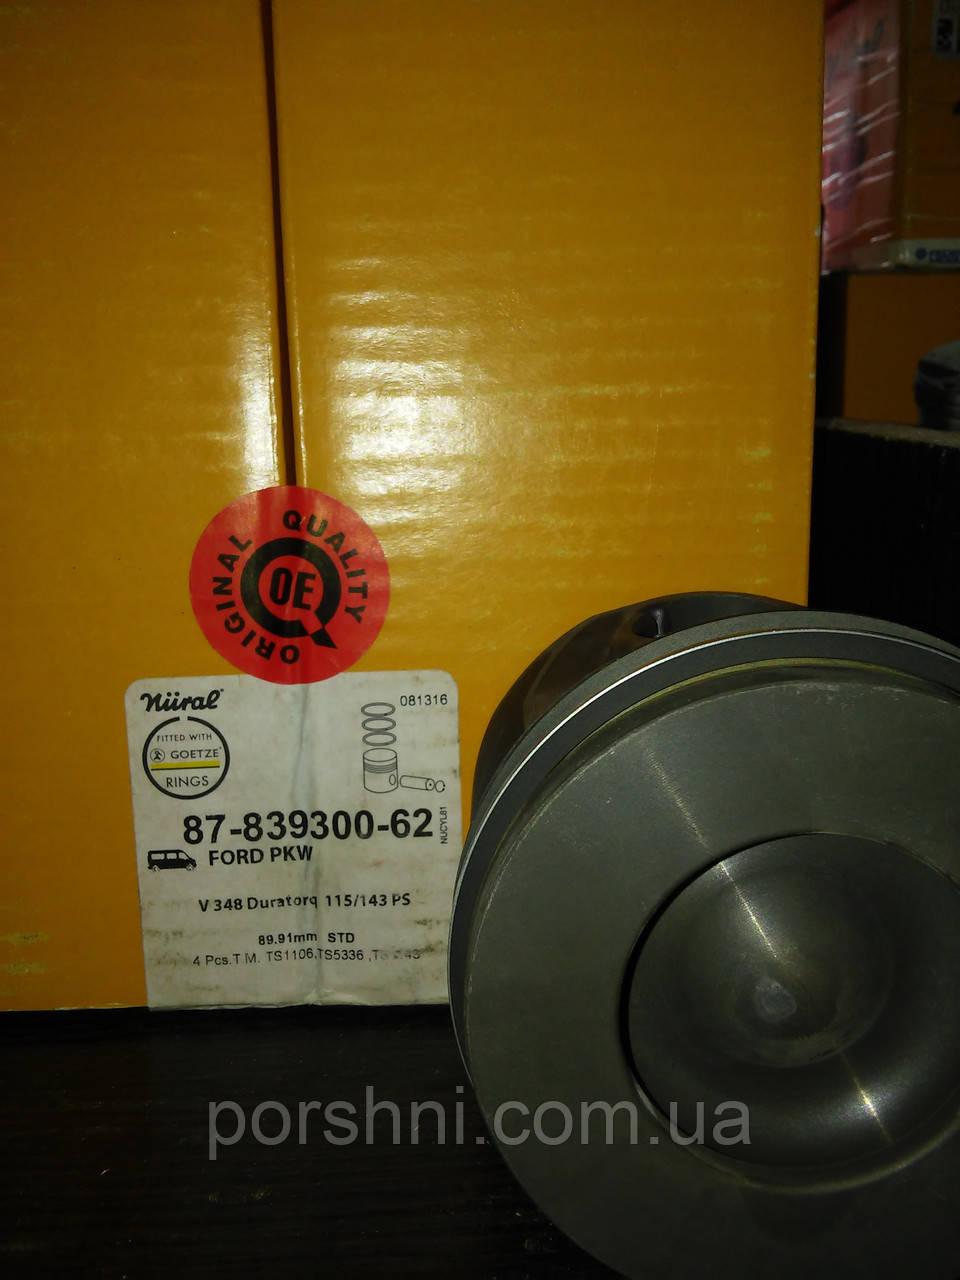 Поршневая  Тransit  2.4 V347 2006 > NURAL FM  87-839300-62 STD  89.91